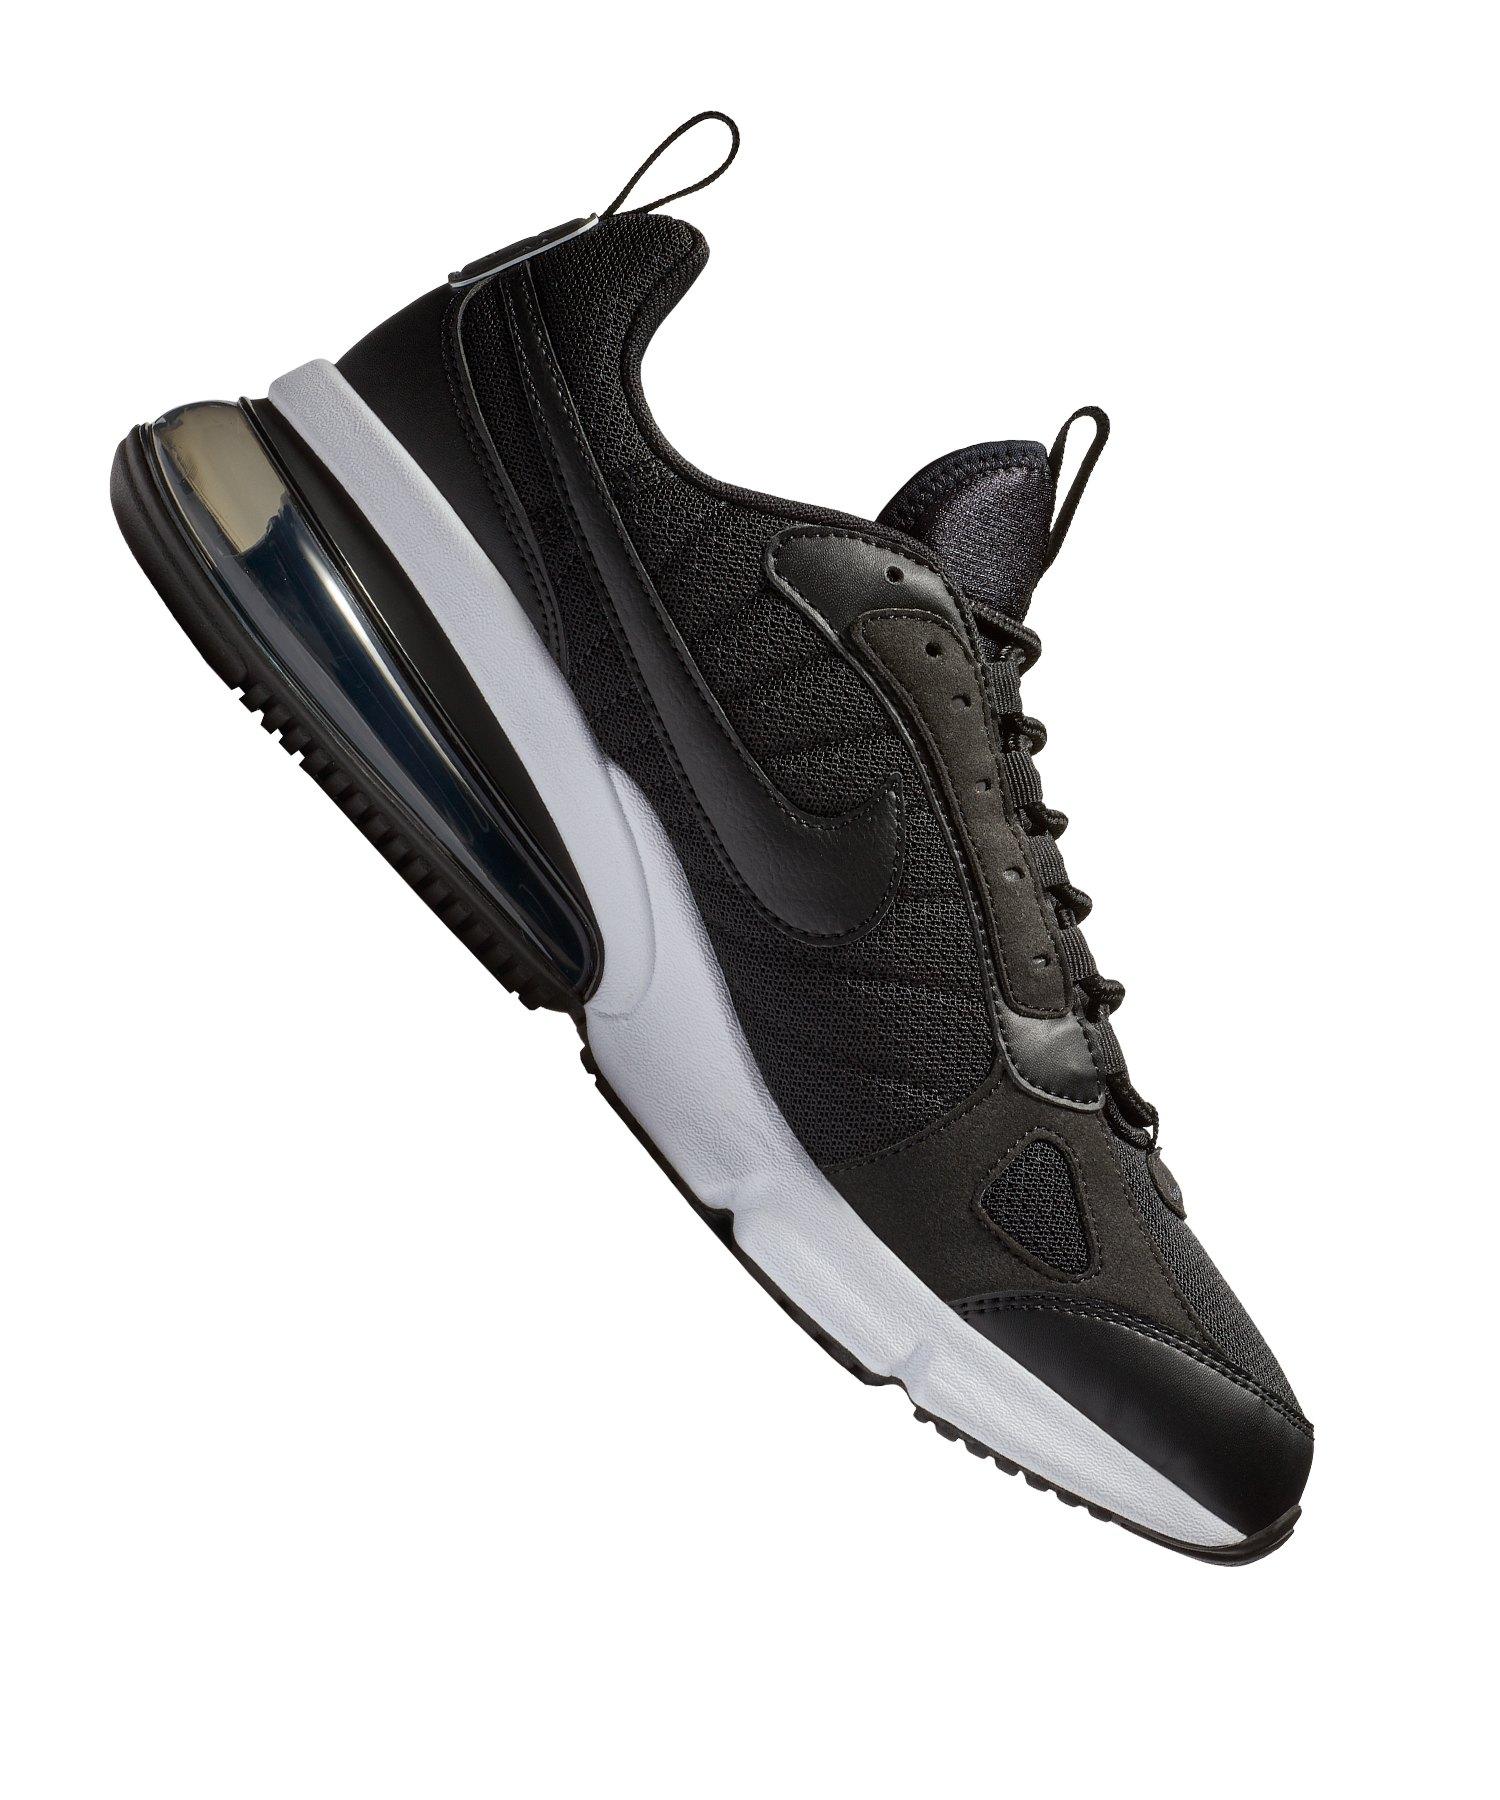 Nike Air Max 270 Futura Sneaker Schwarz Weiss F001